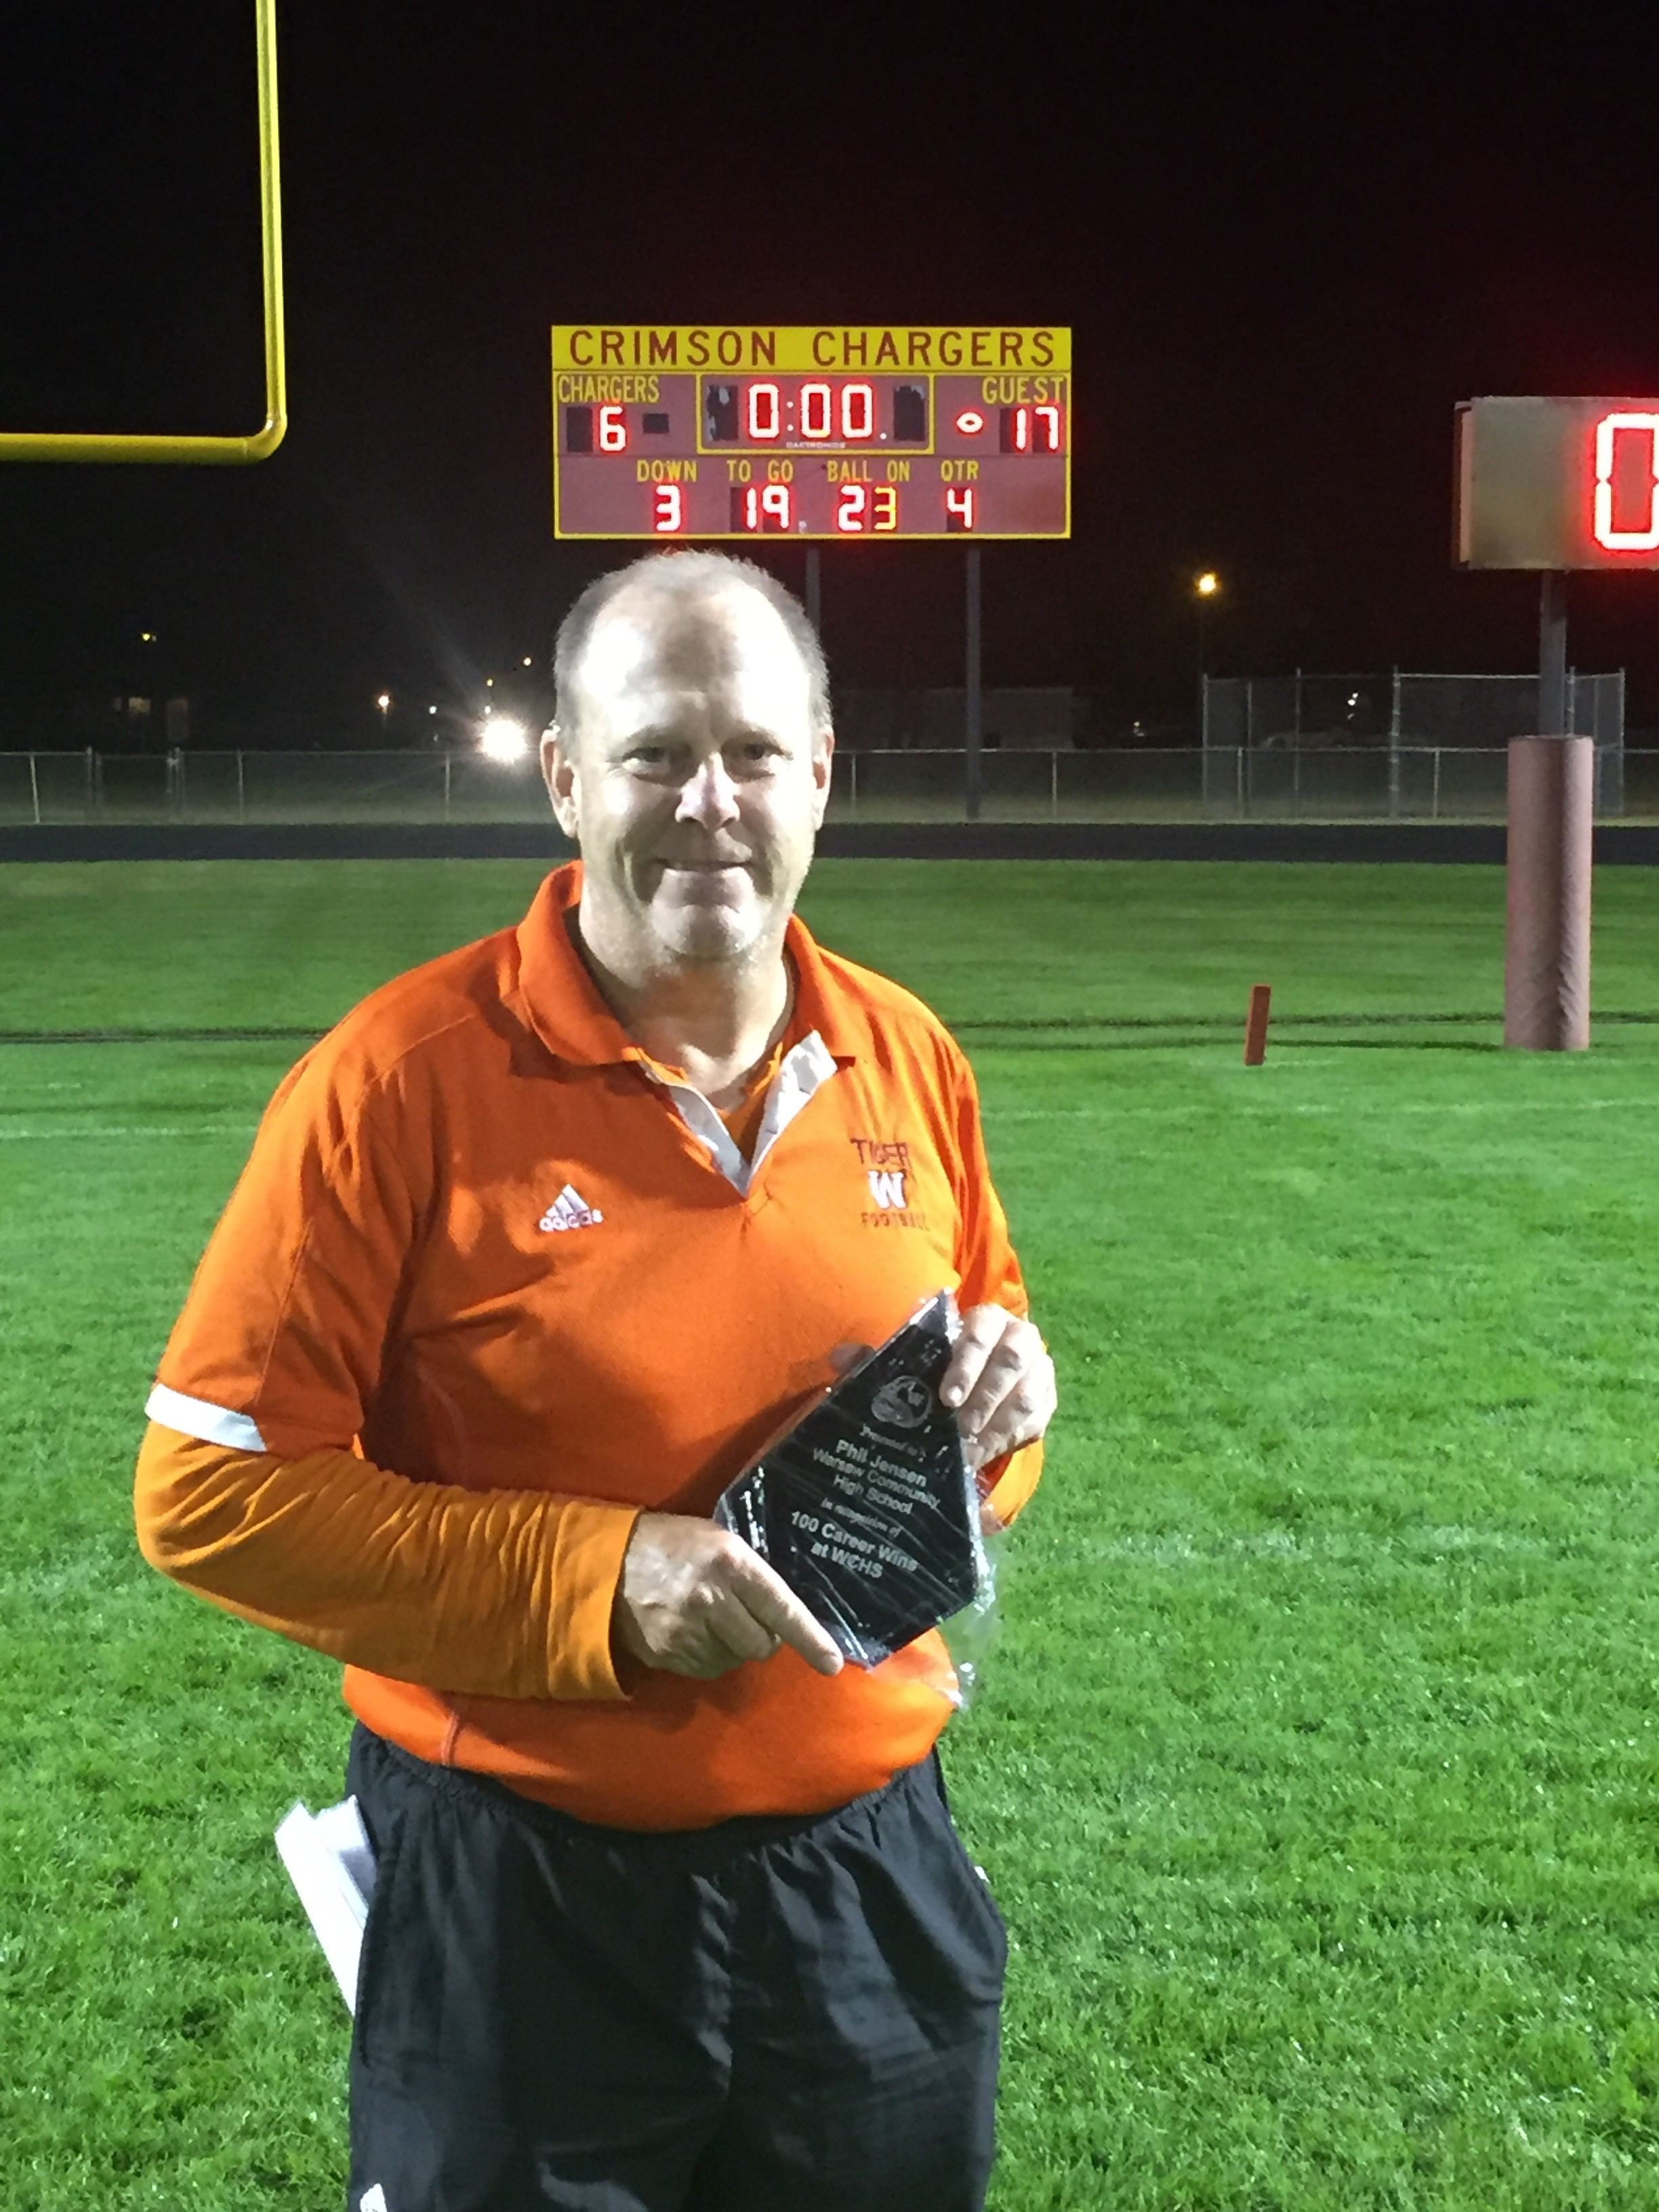 WCHS Head Football Coach Jensen Announces Retirement